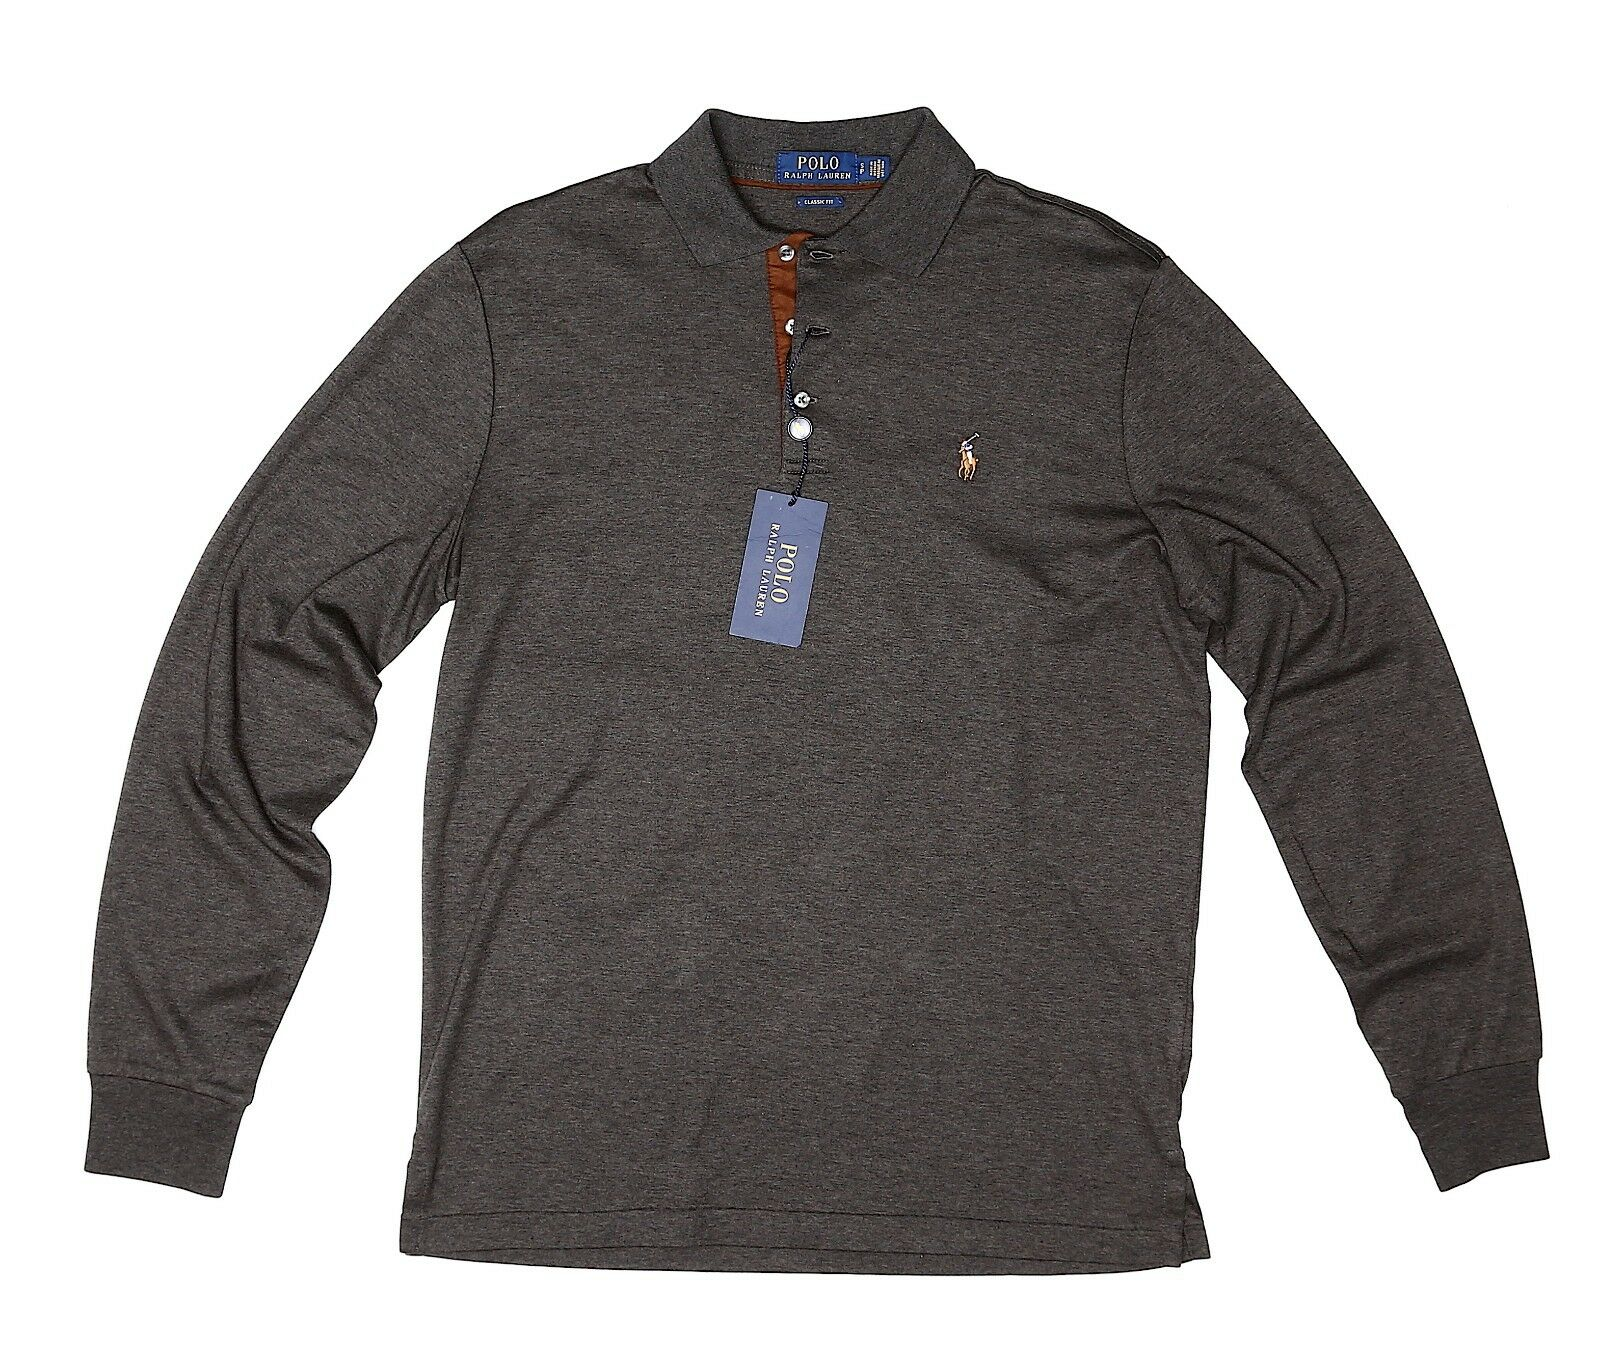 Polo Ralph Lauren Mens Grey Long Sleeve Classic Fit Shirt Sz S 4722